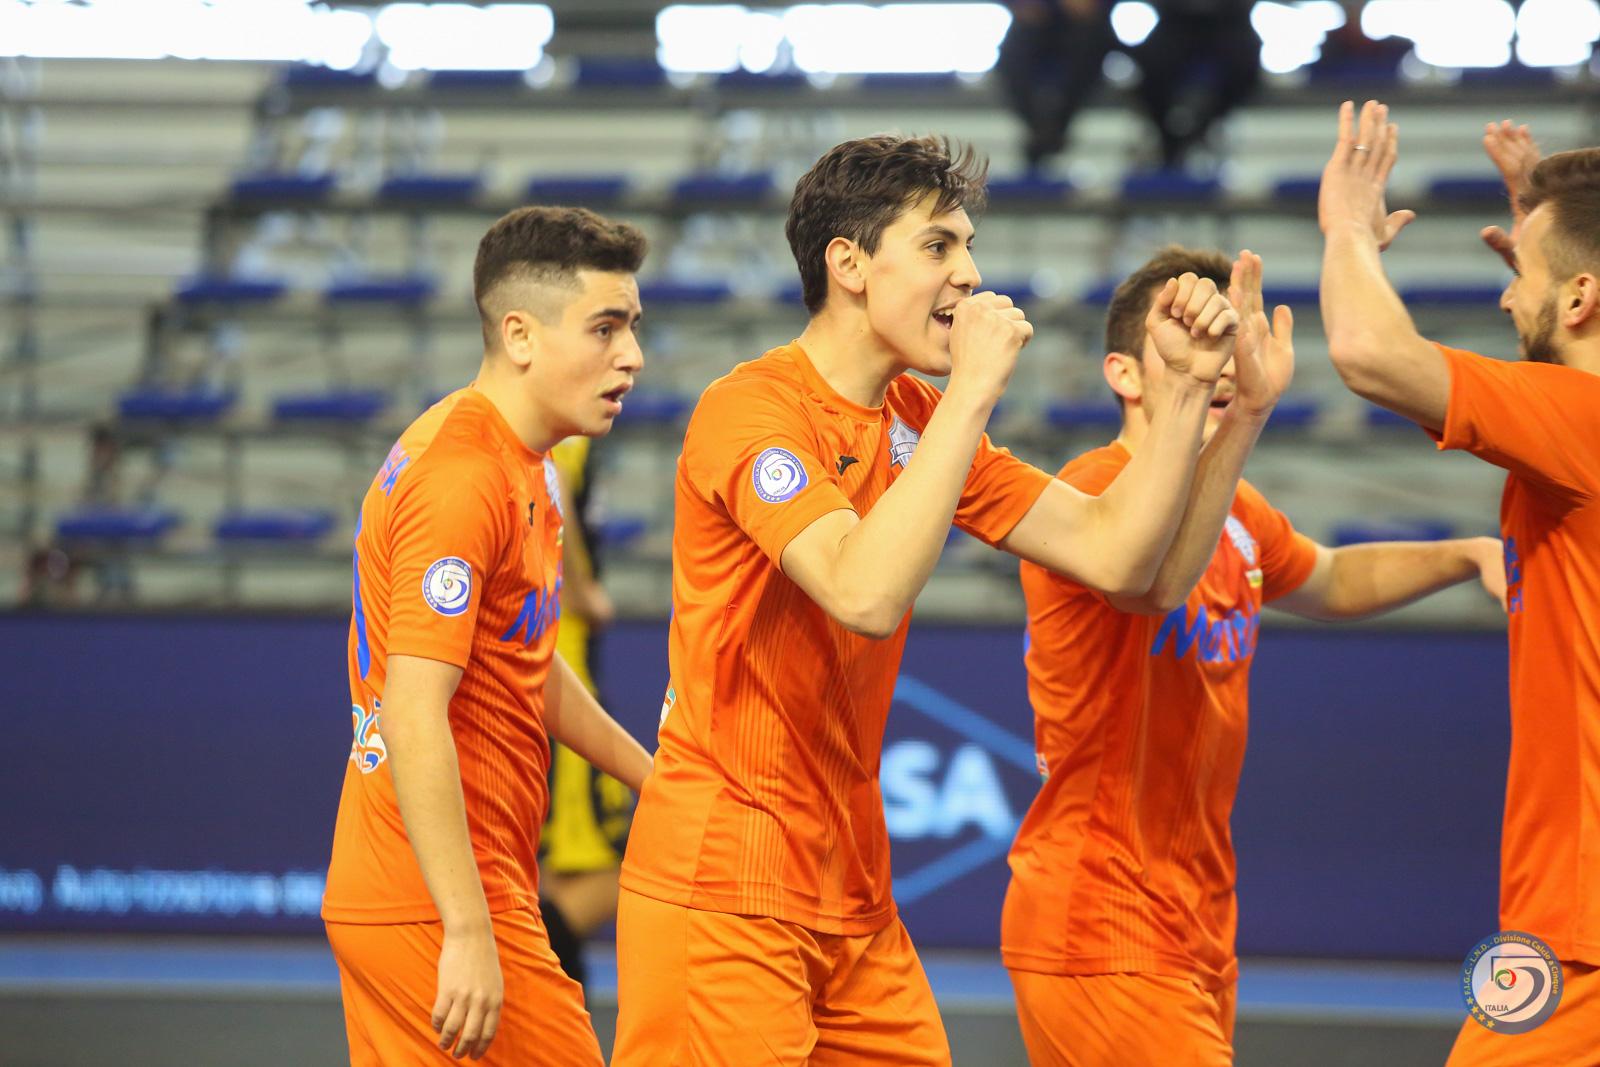 COPPA ITALIA CALCIO A 5 - FINAL EIGHT PESARO 2018